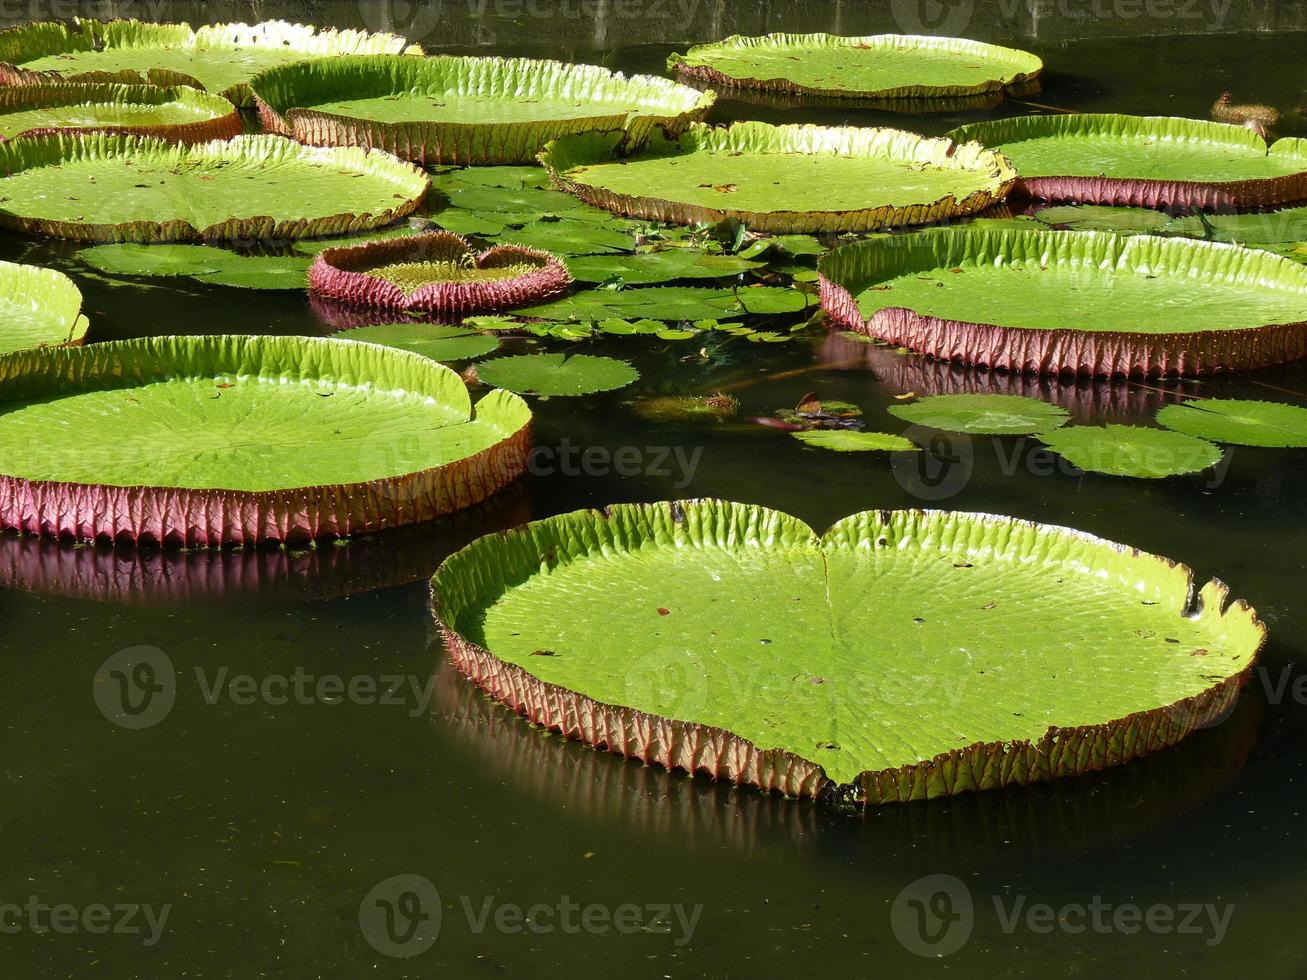 señor seewoosagur ramgoolam jardín botánico foto